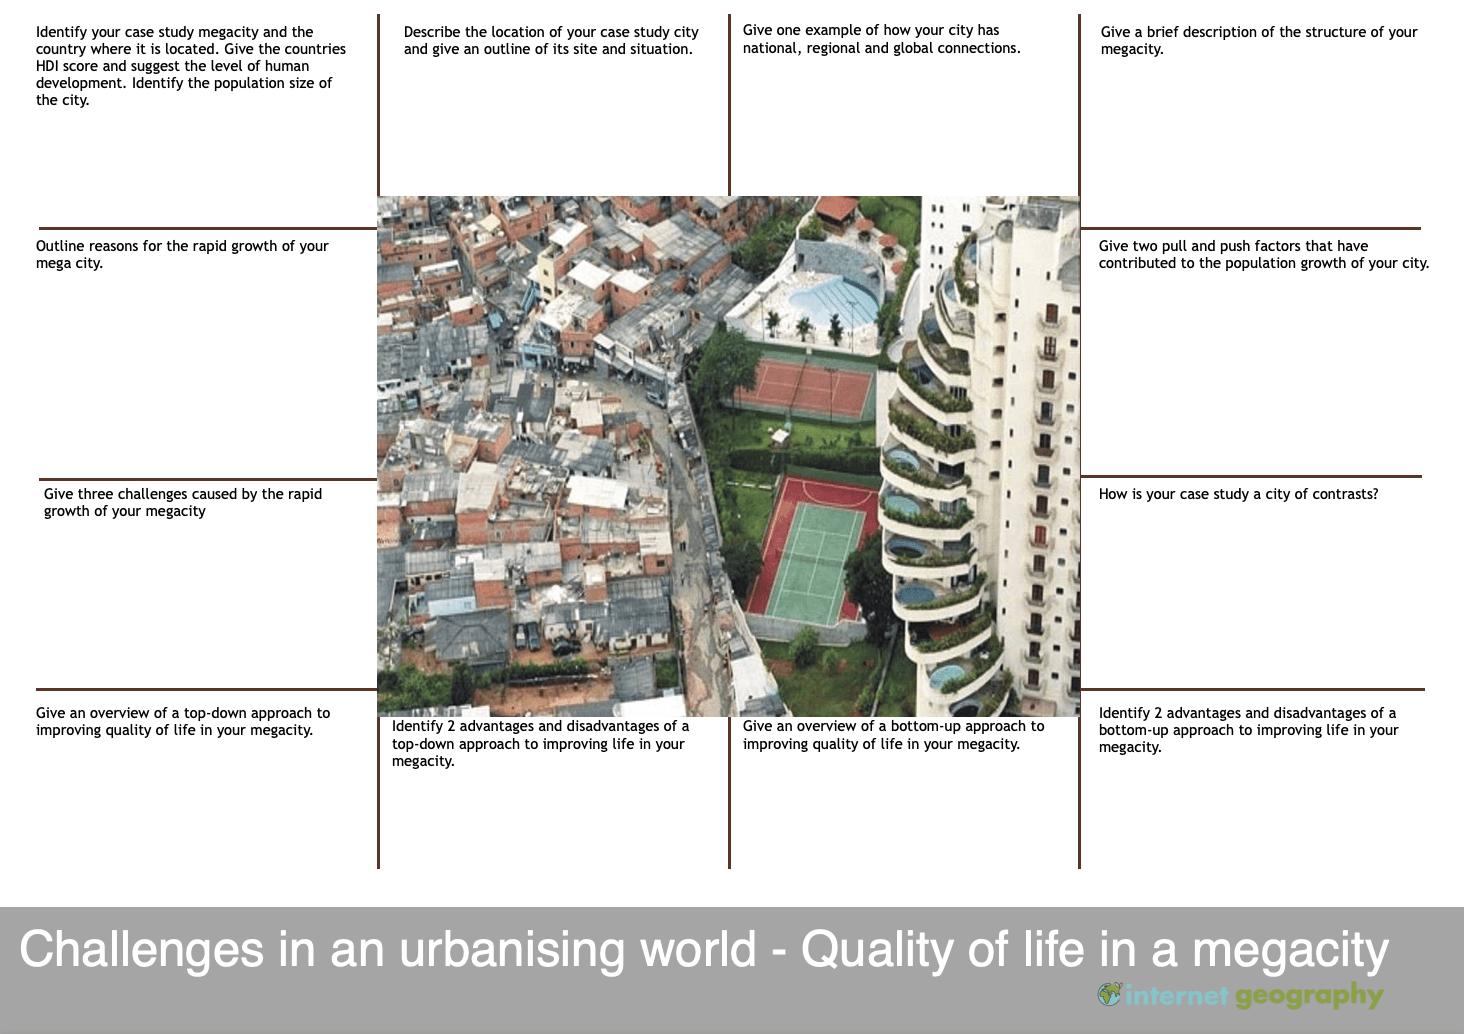 Challenges in an urbanising world revision mat 3 edexcel b